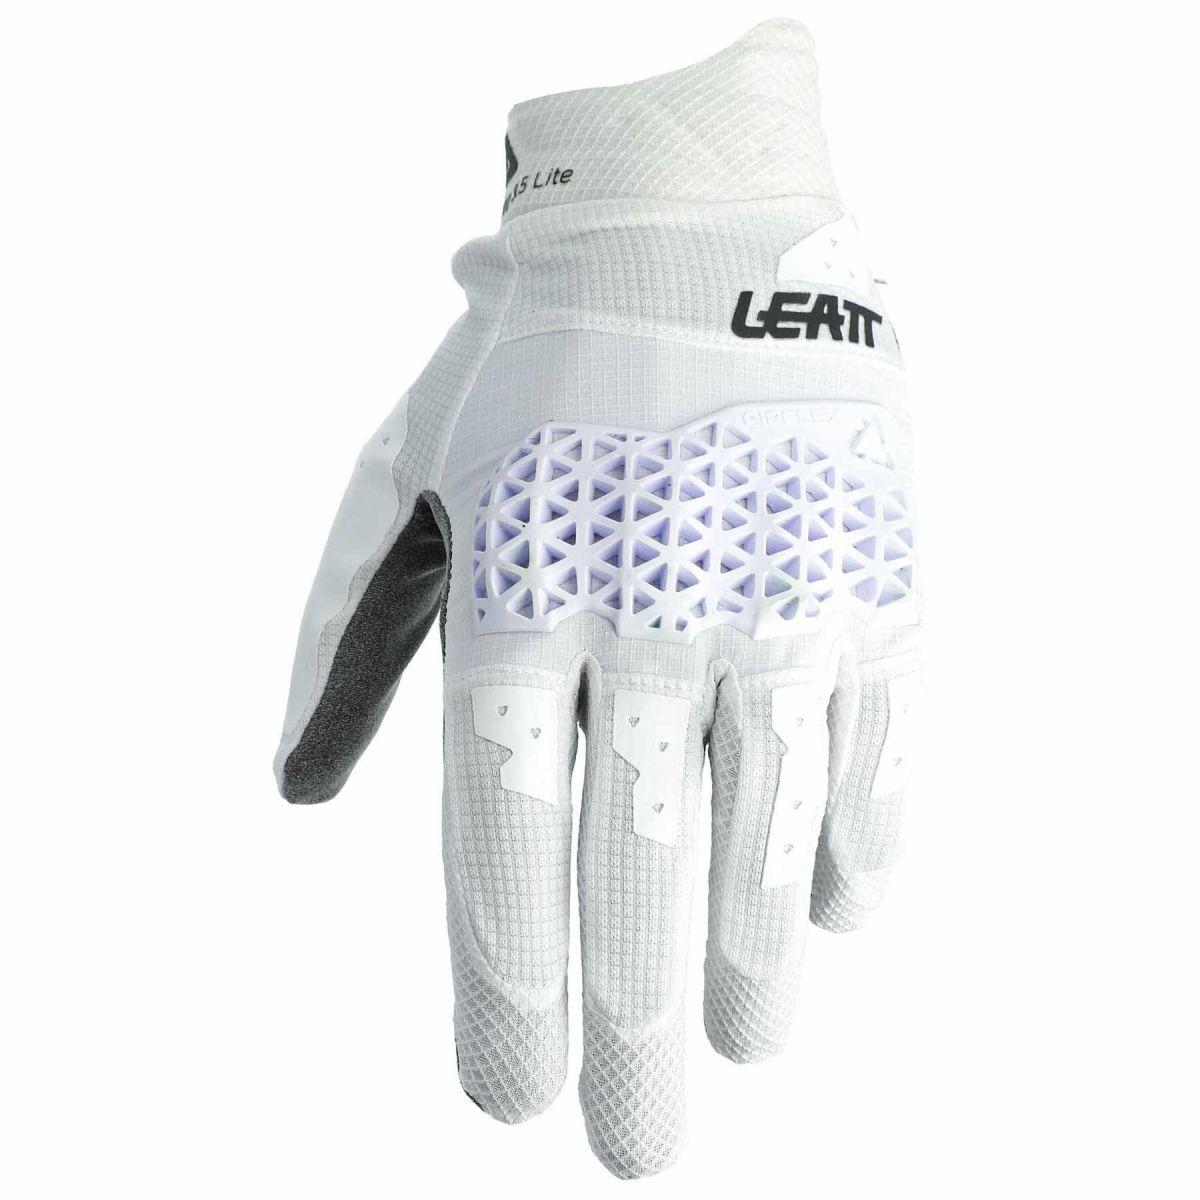 Leatt Moto 3.5 Lite White перчатки